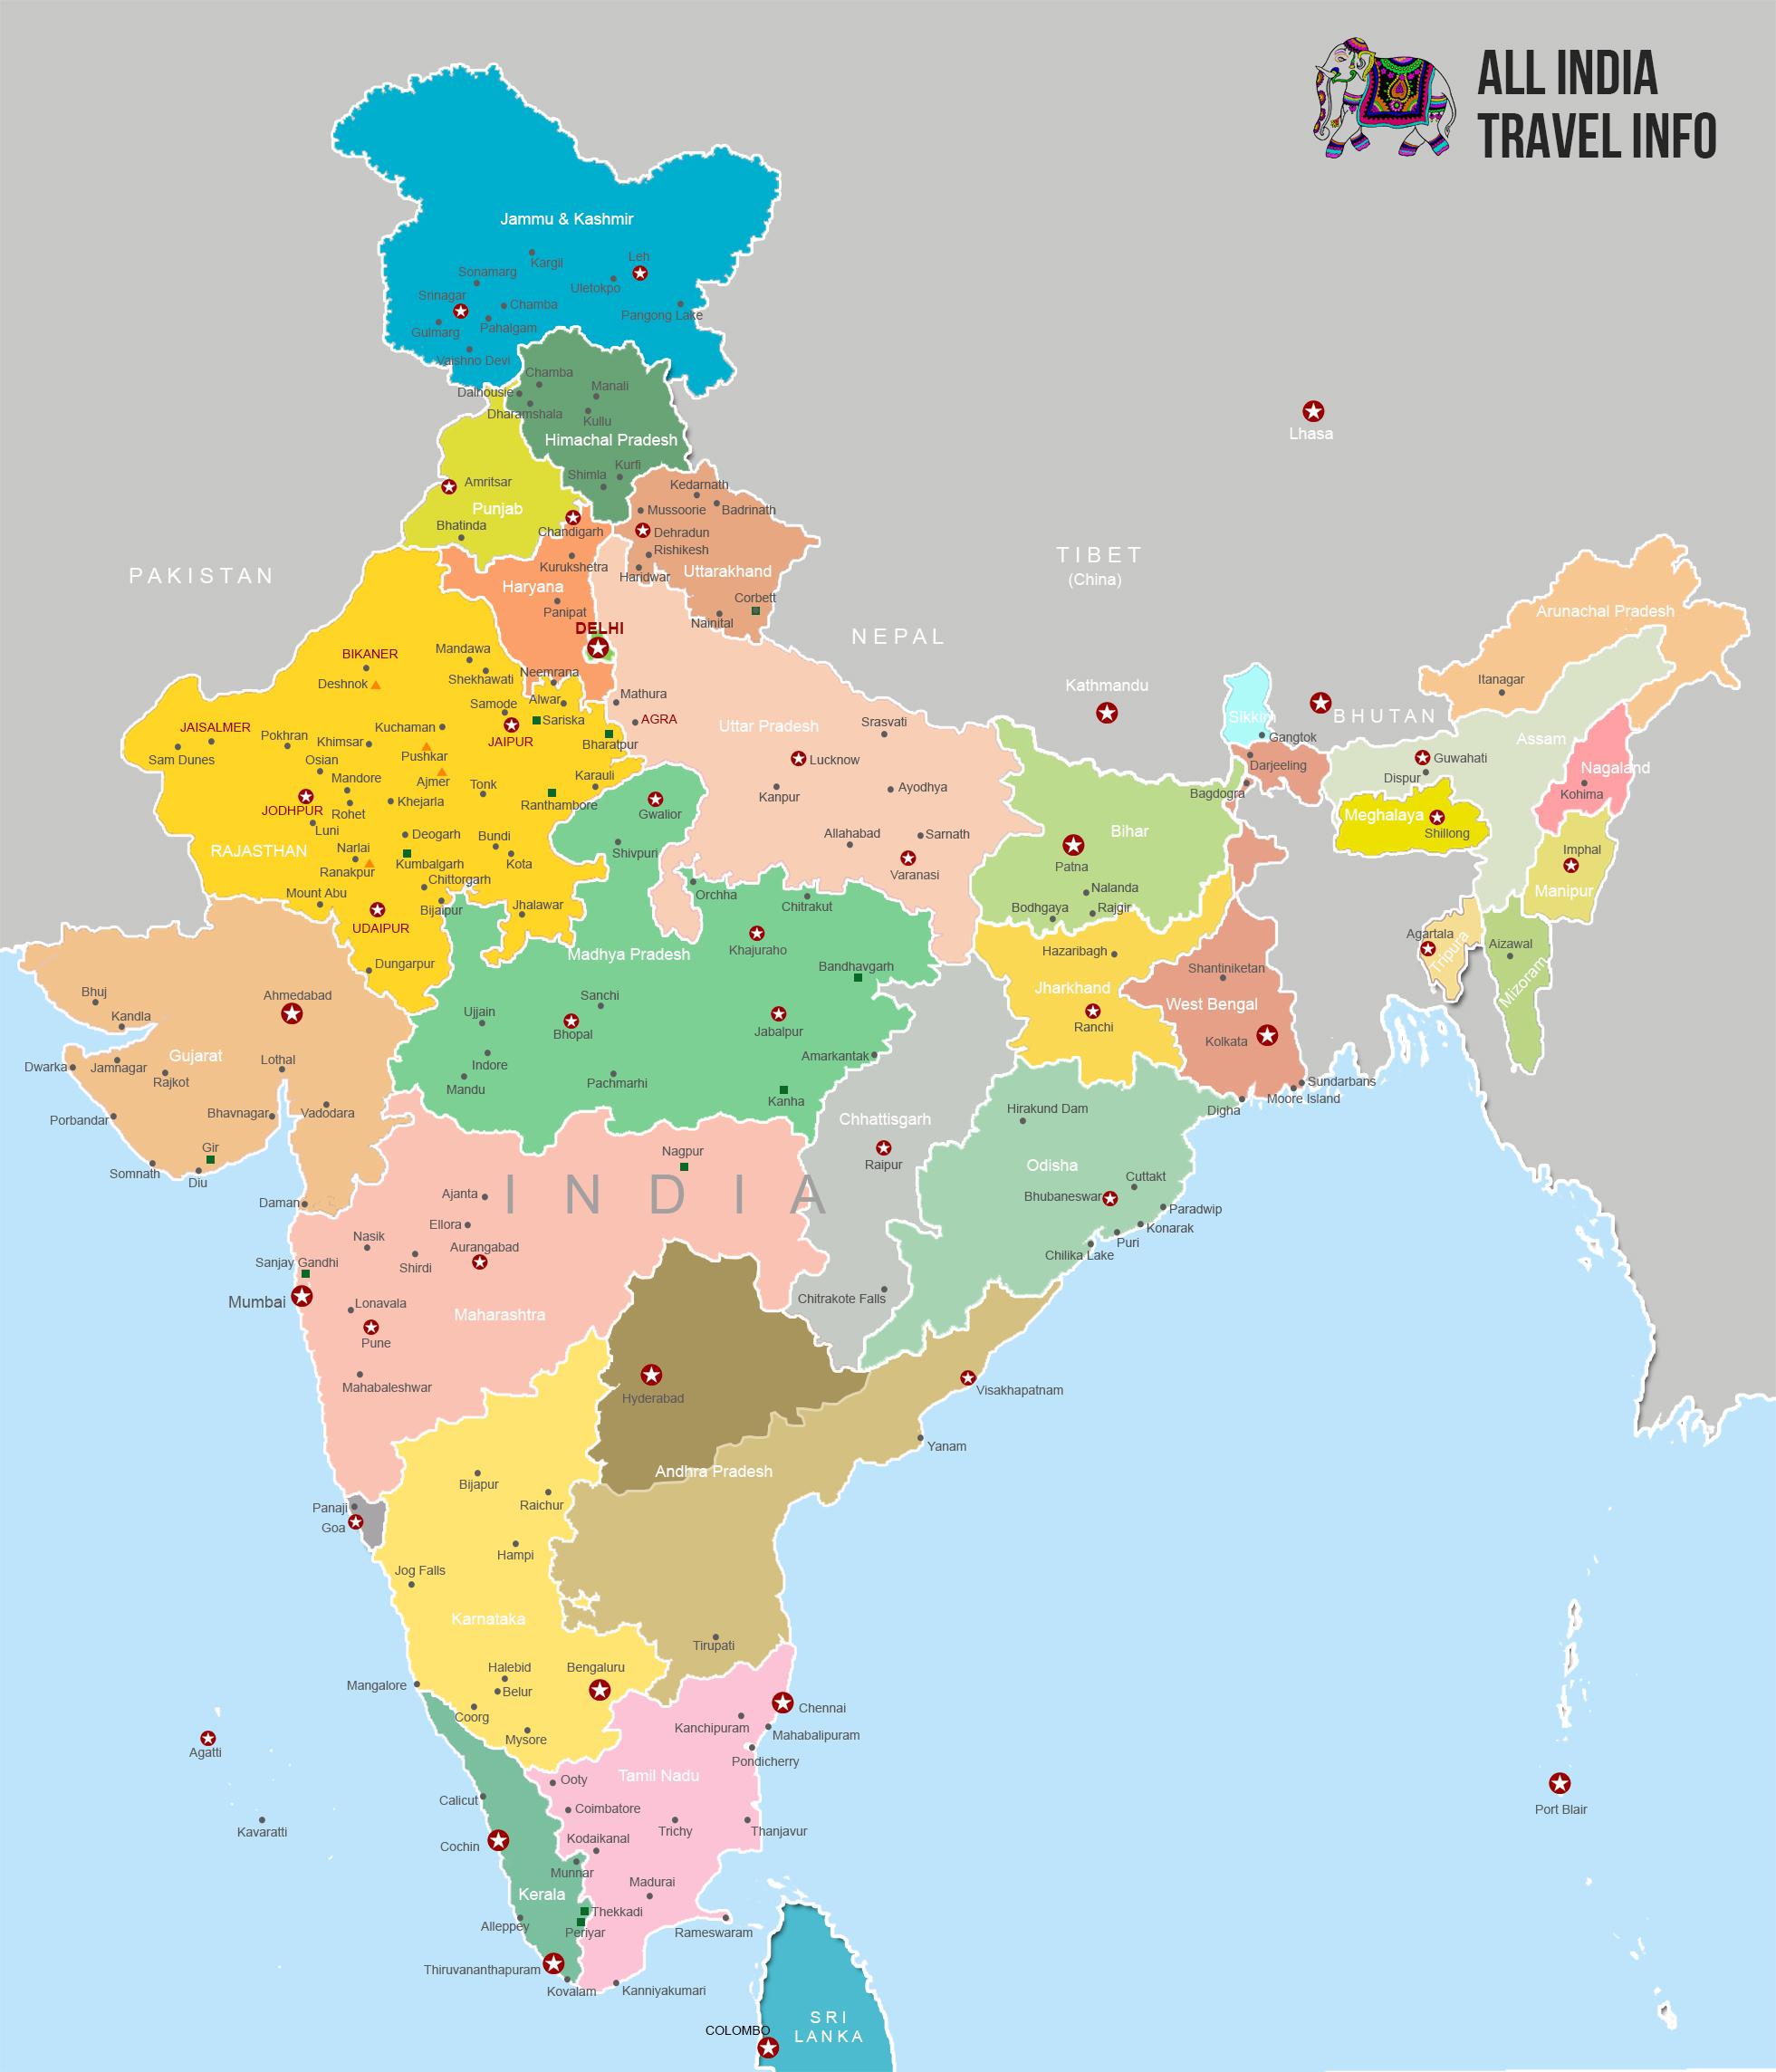 India Travel Map - India us map